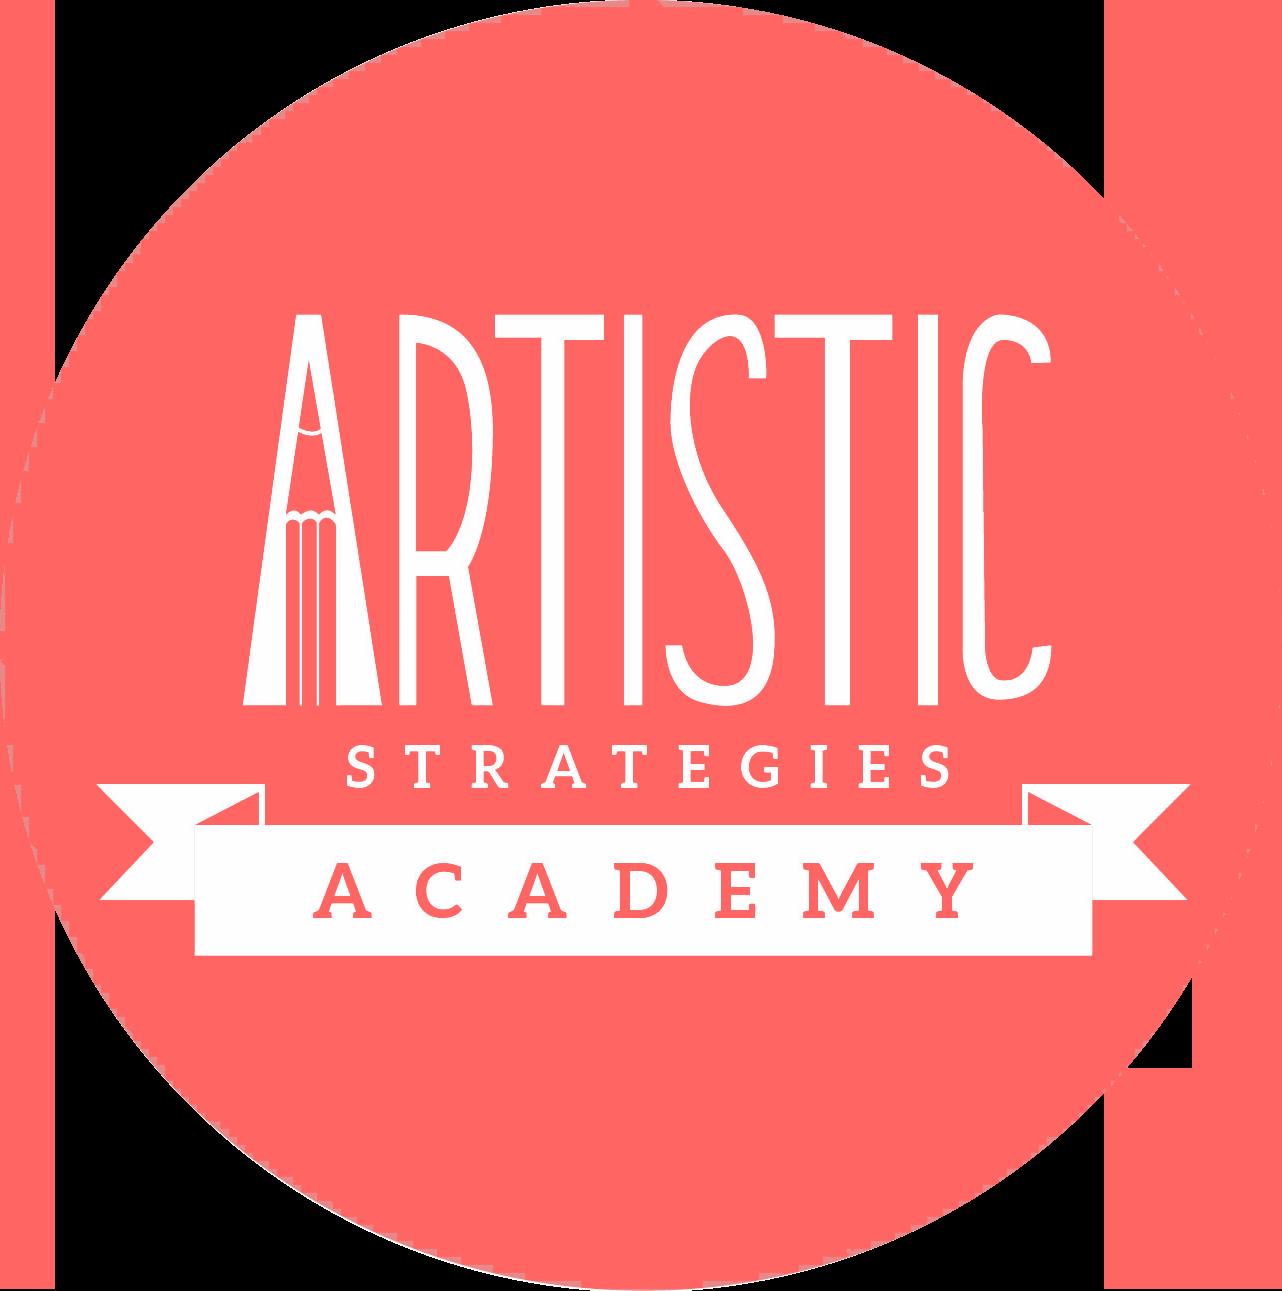 artisticstrategies